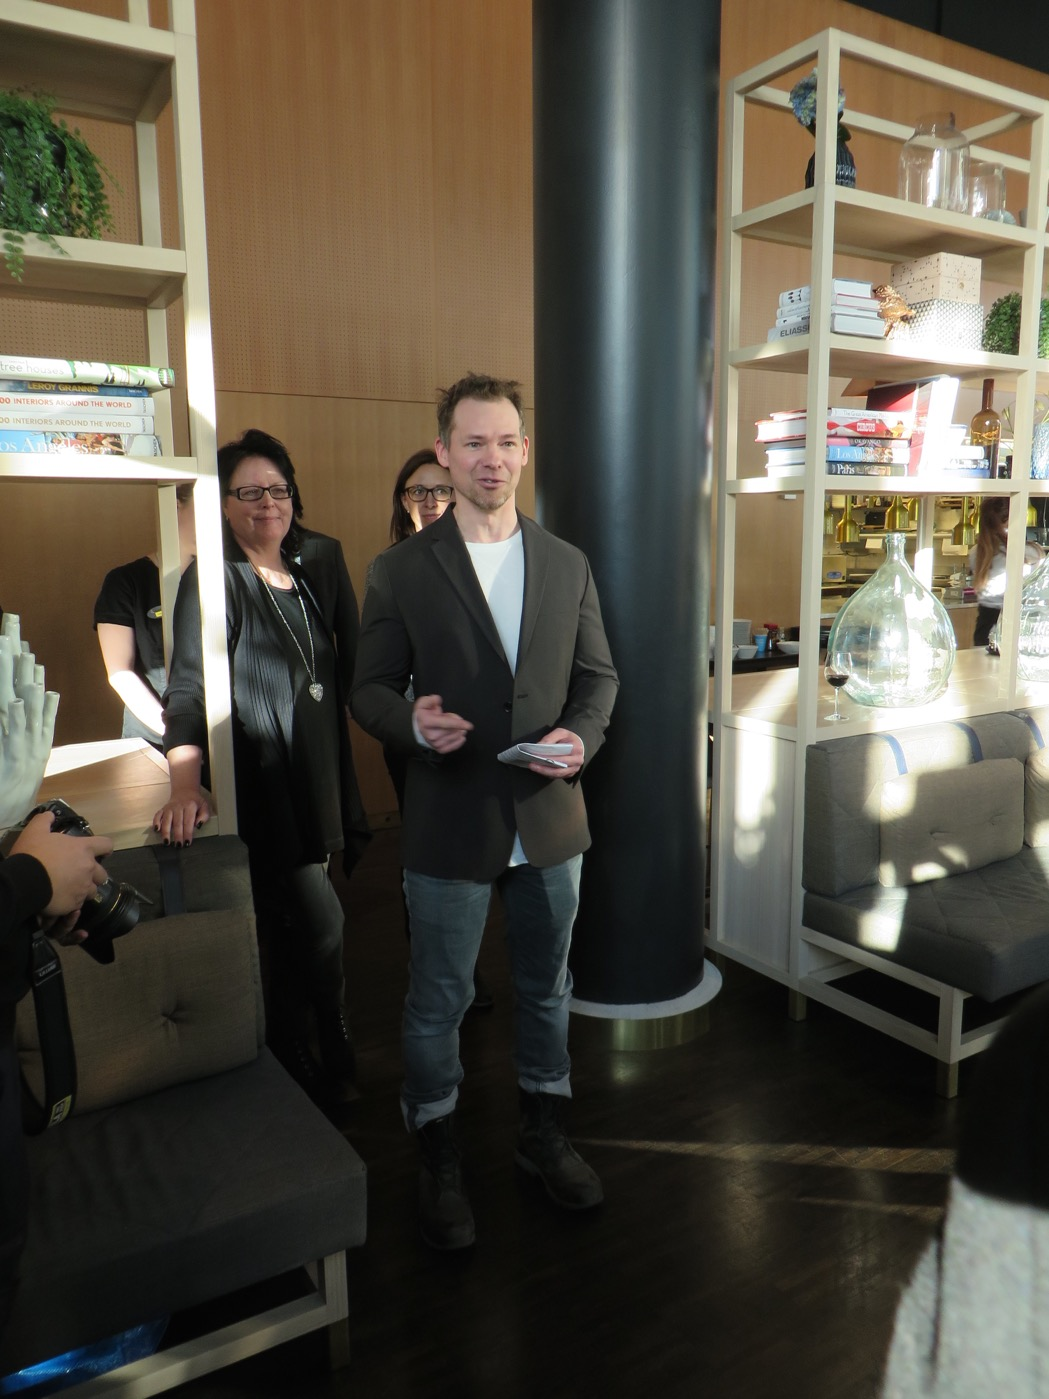 Arrangör Daniel Golabiewski för Glassfestivalen